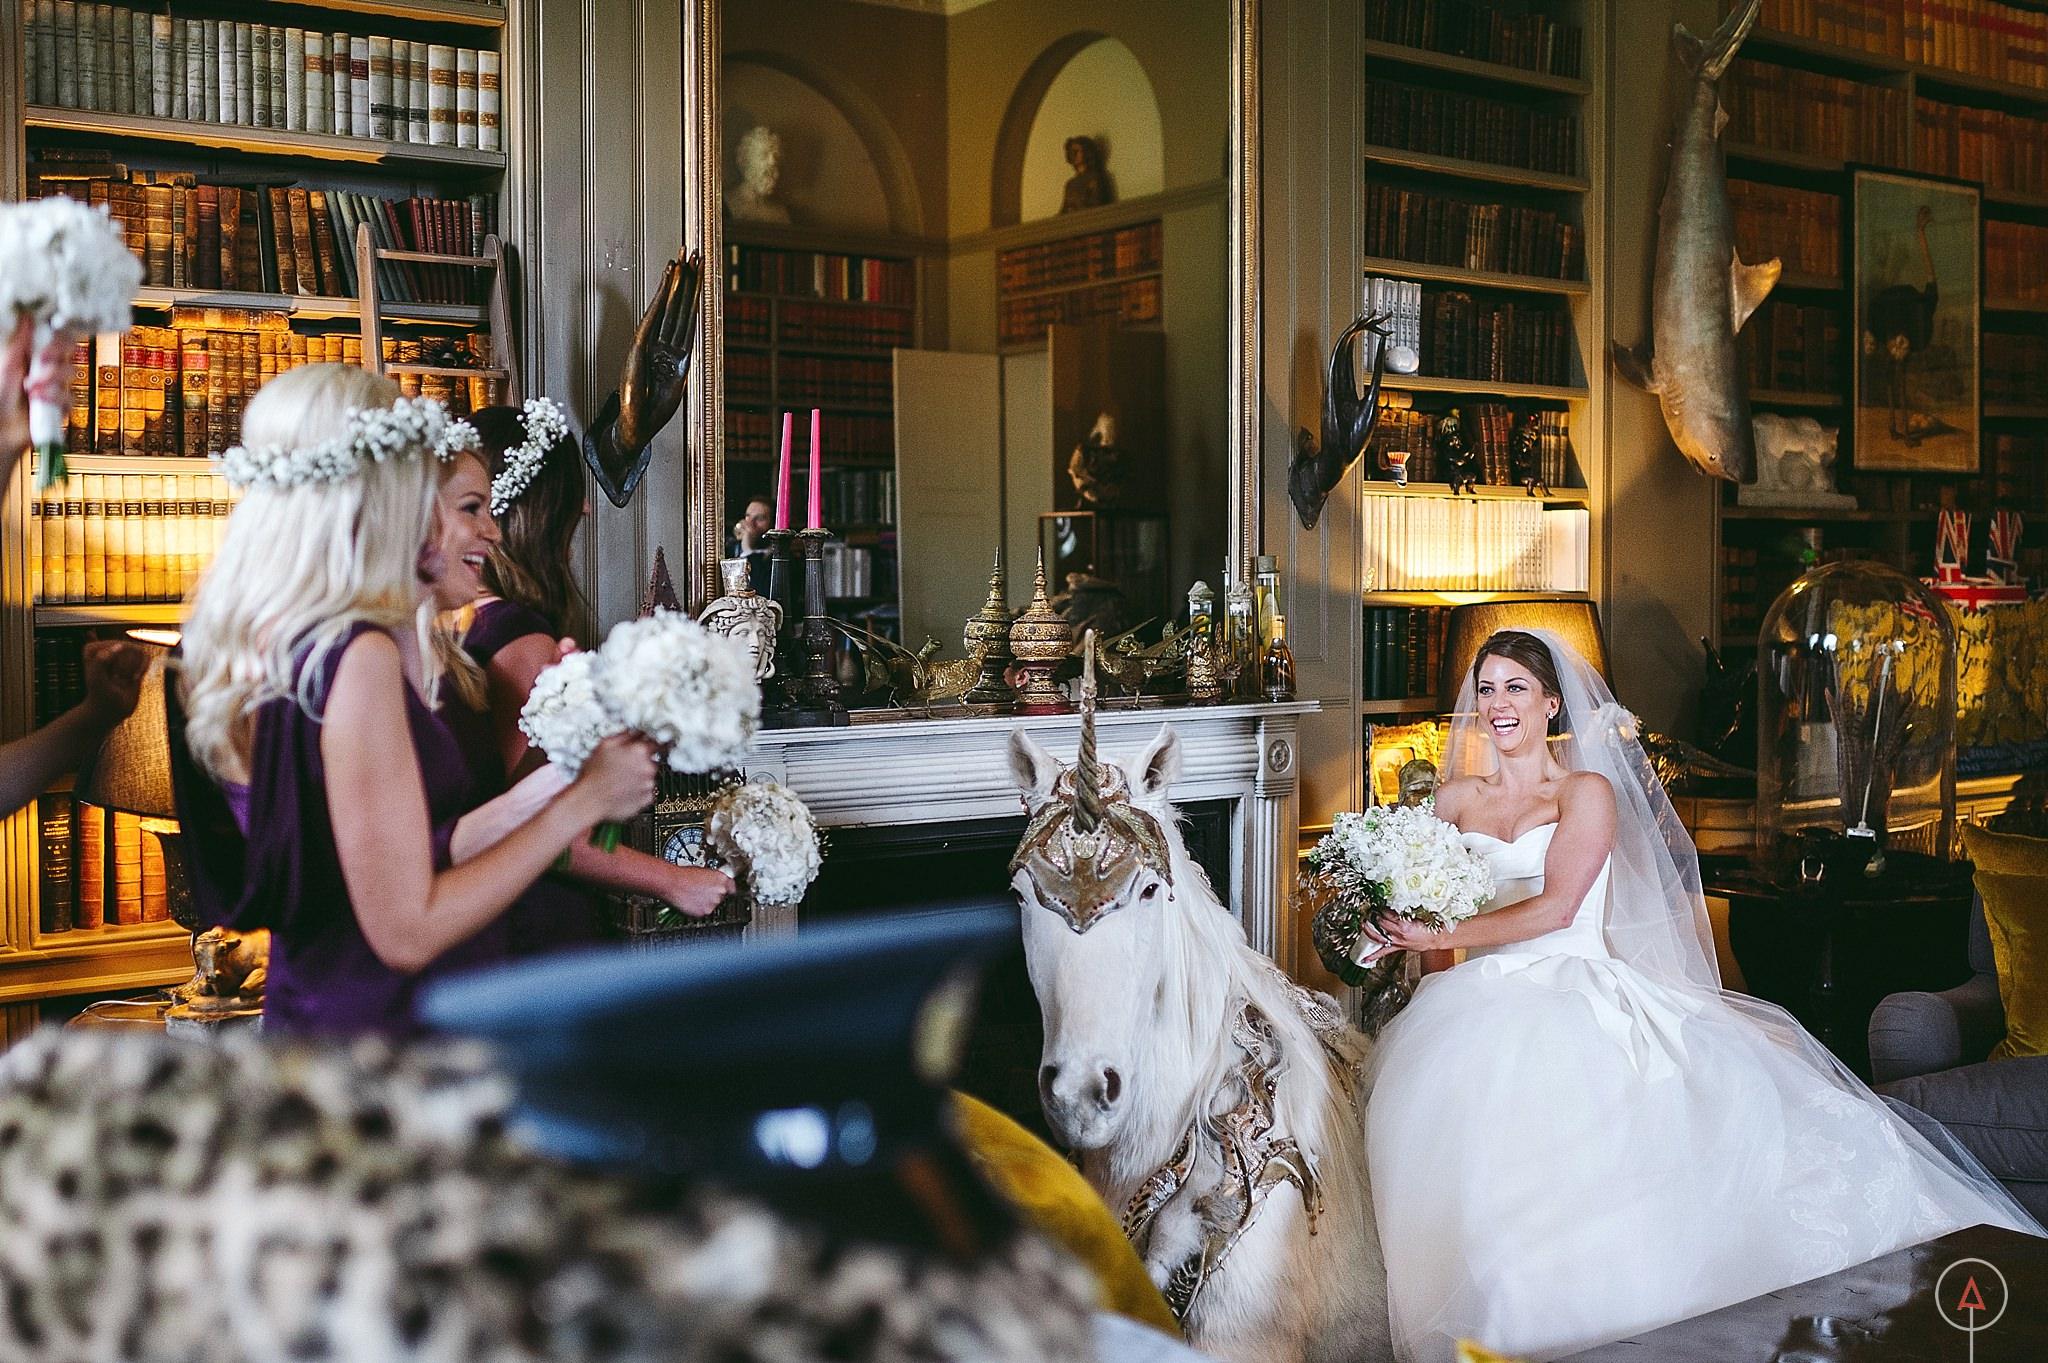 cardiff-wedding-photographer-aga-tomaszek_0279